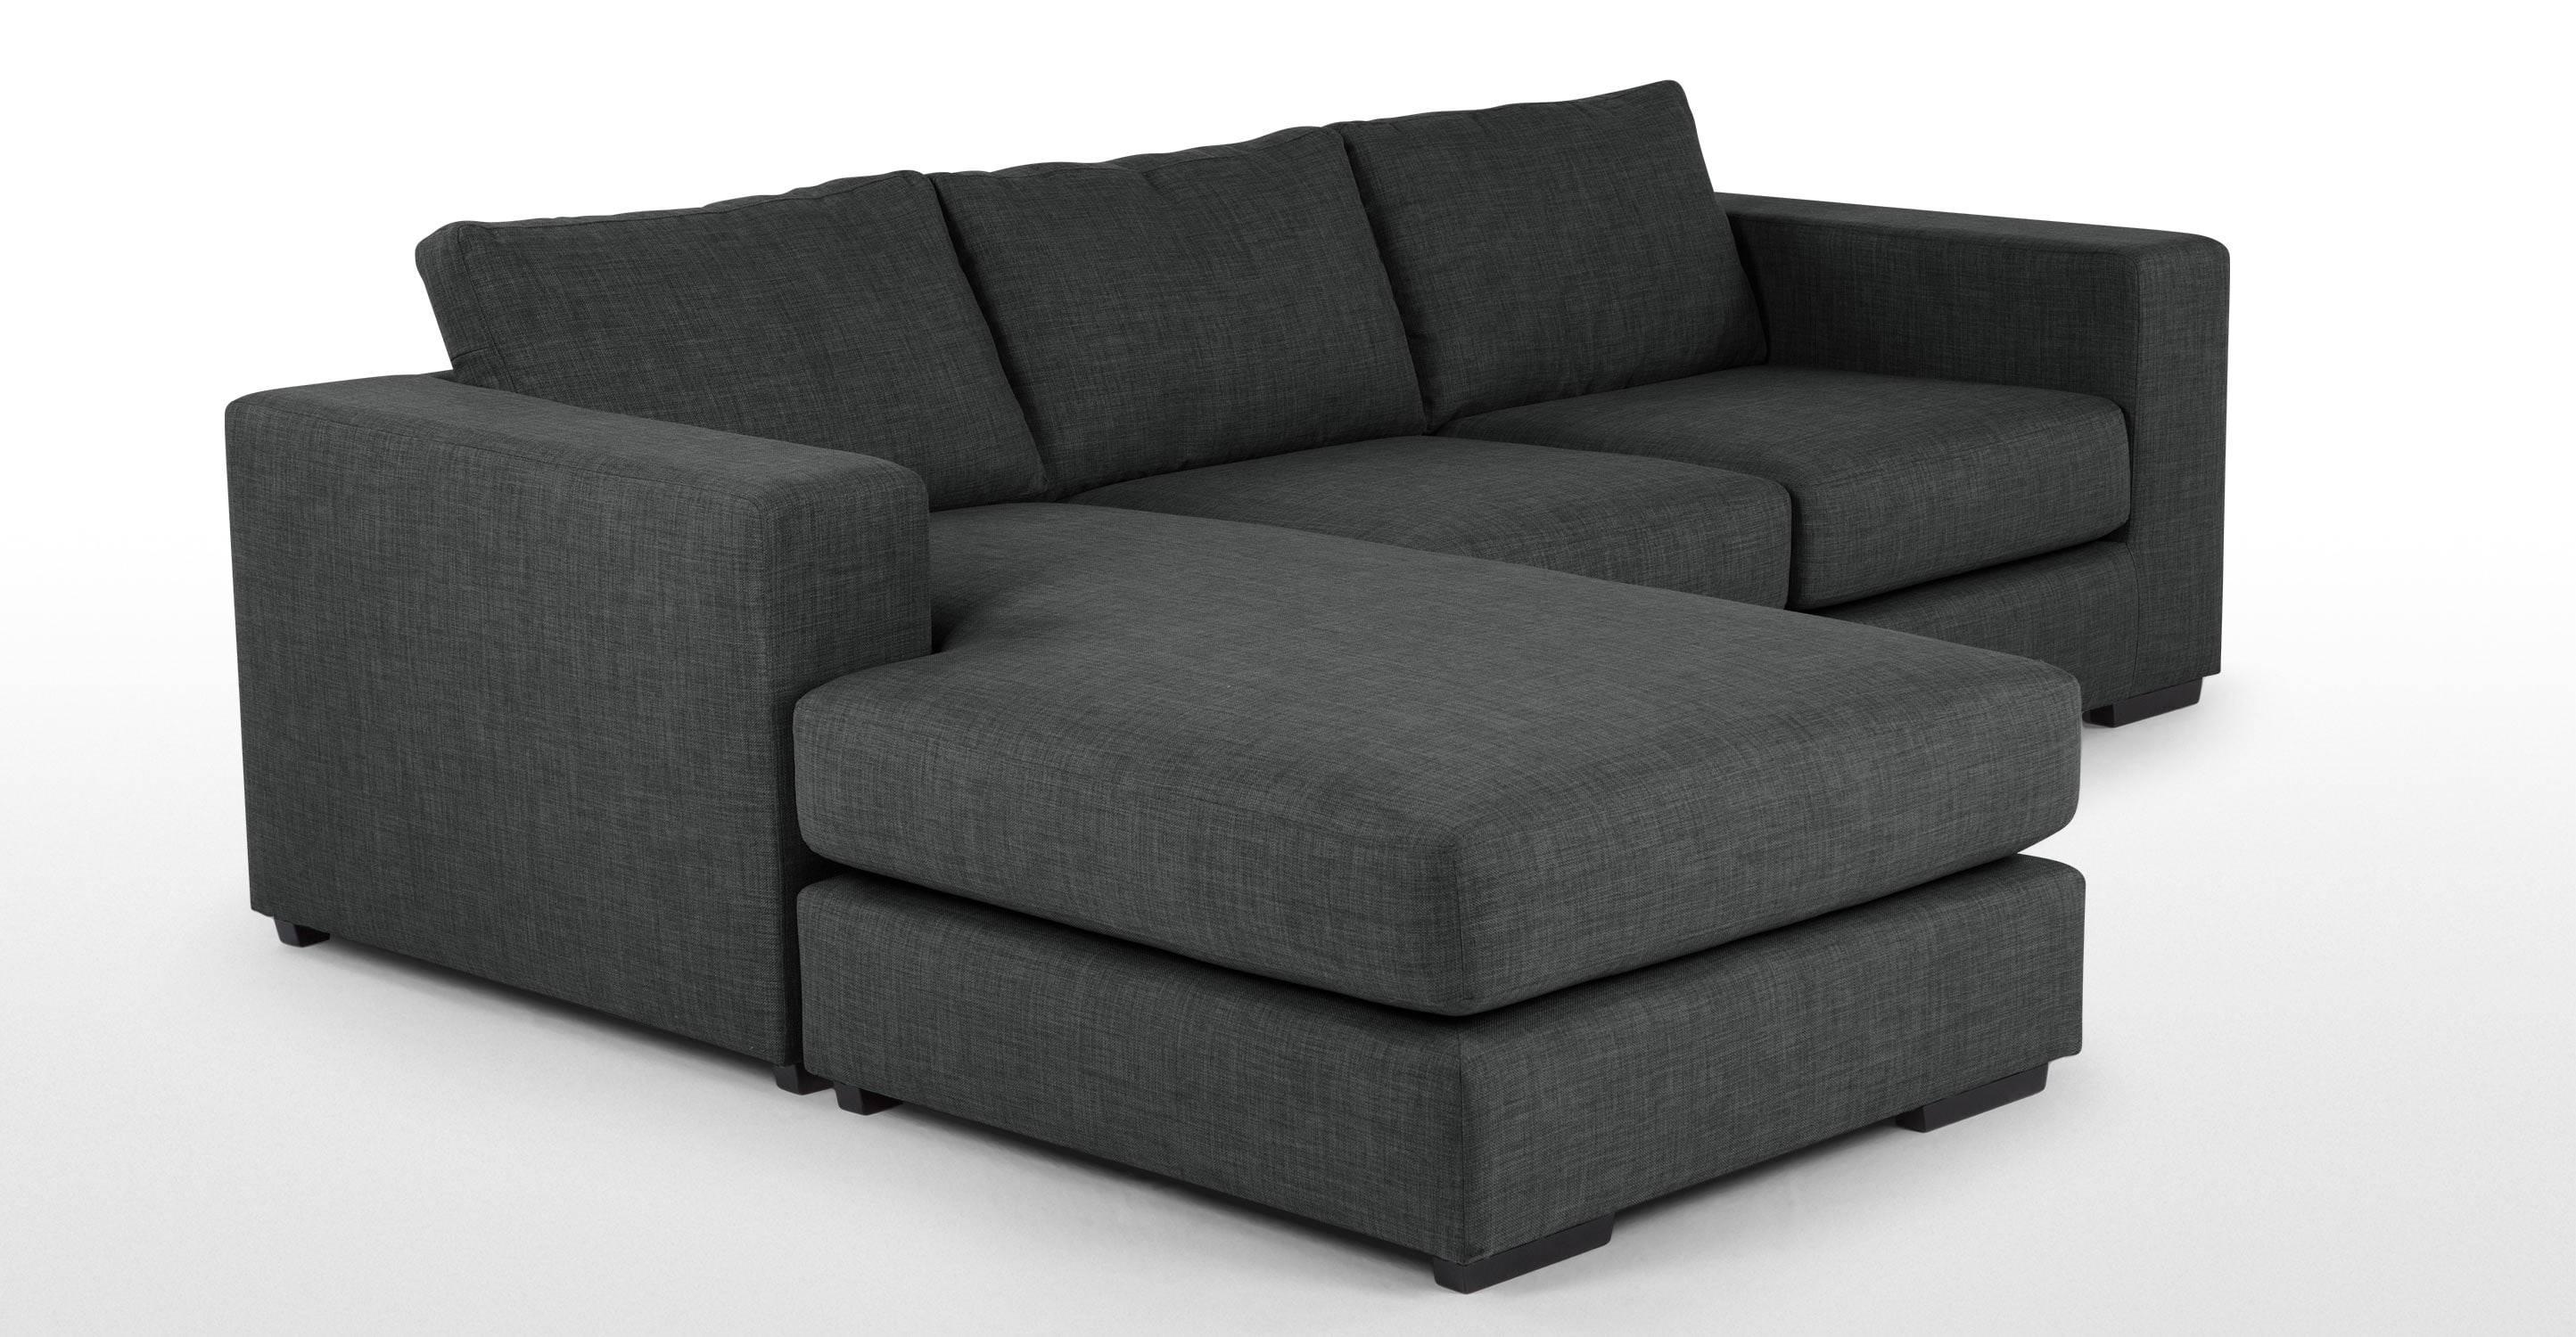 Mortimer 4 Seater Modular Corner Sofa, Shadow Grey | Made with regard to 4 Seat Sofas (Image 24 of 30)